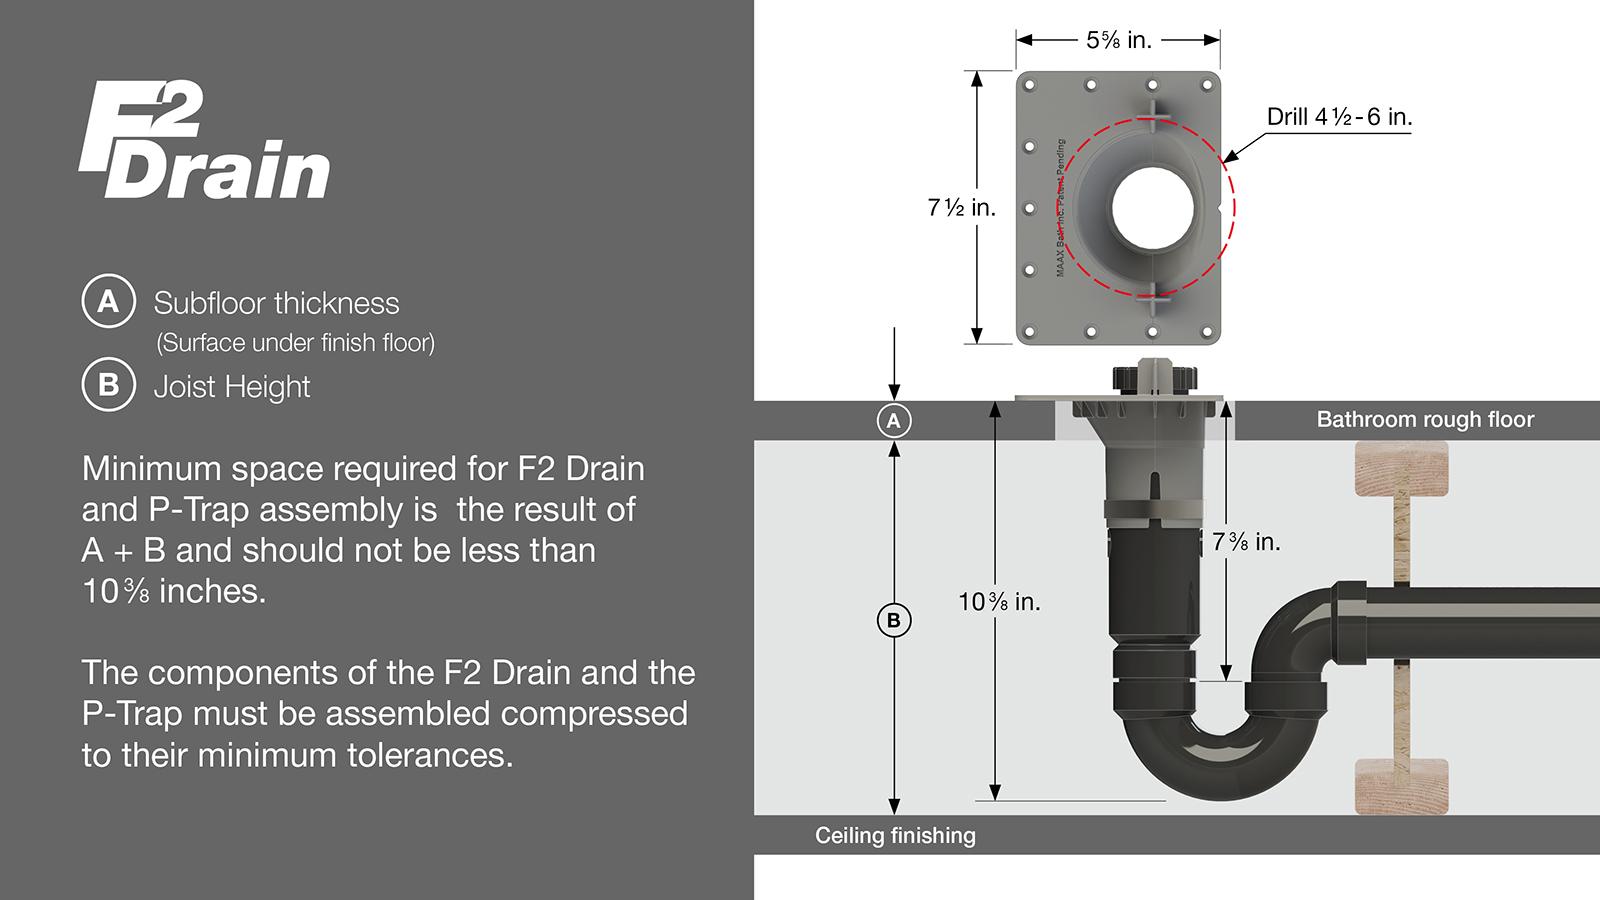 MAAX F2 Drain: Minimum Space Required